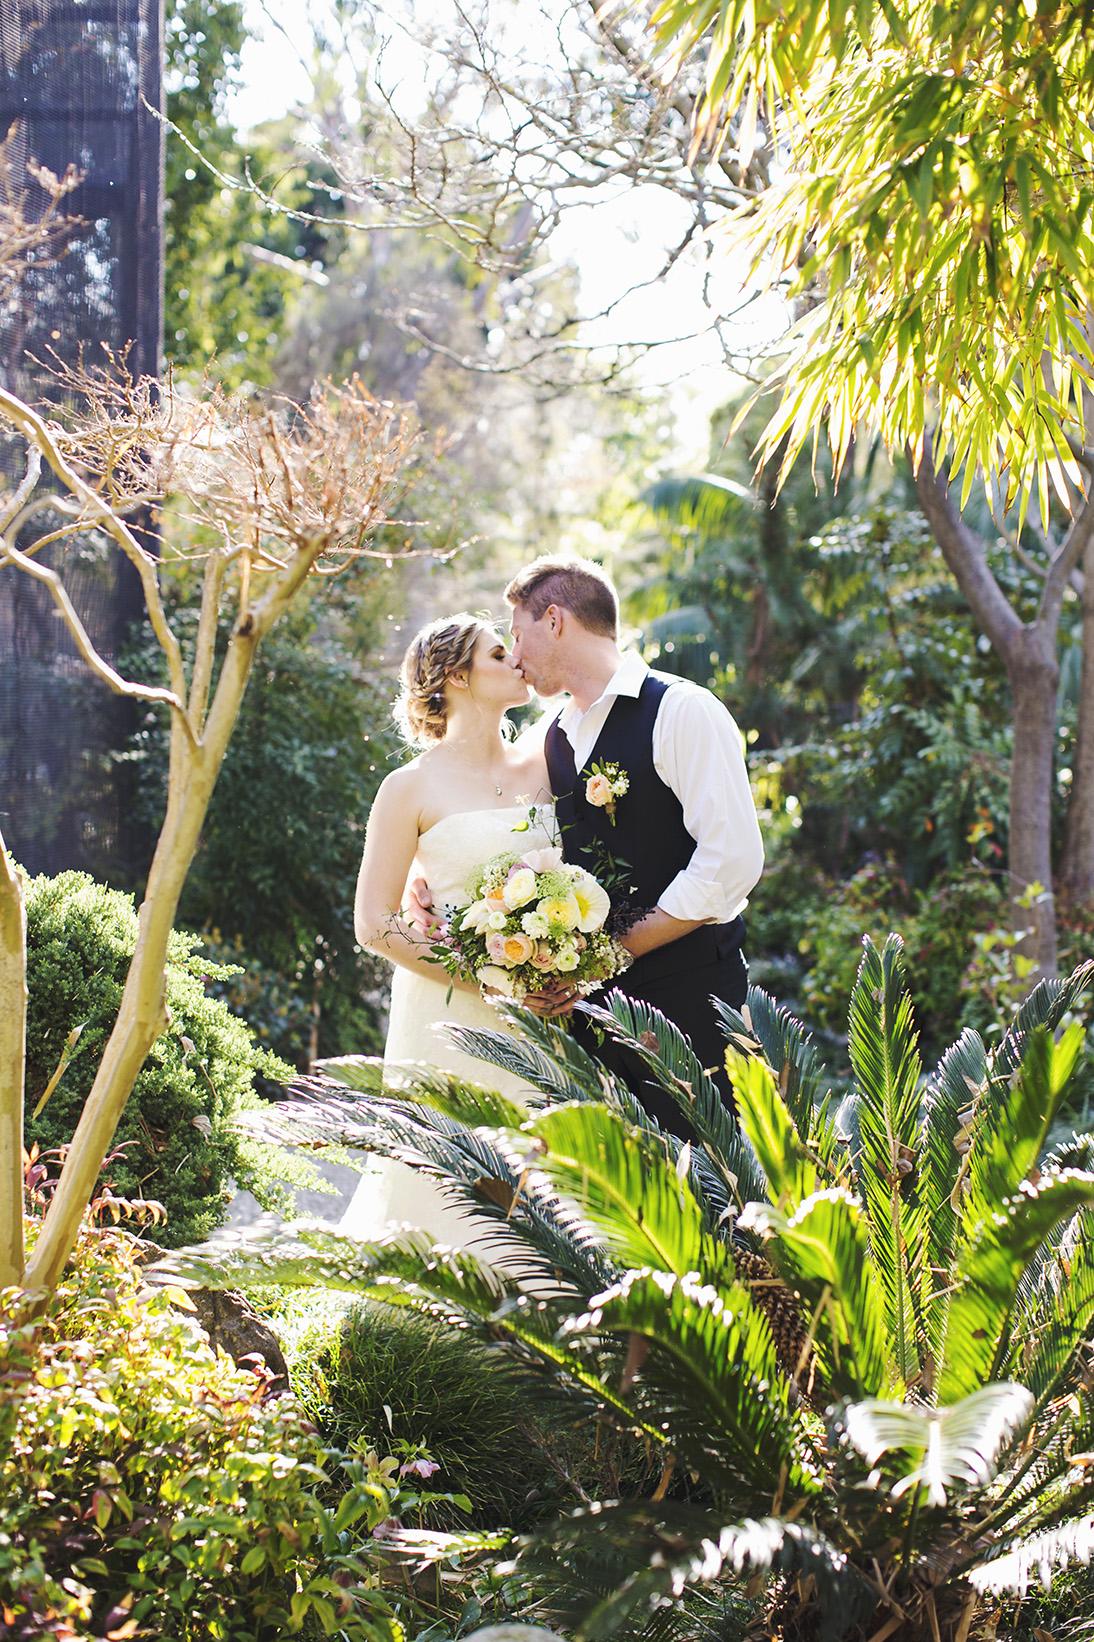 Surprise Adelaide Zoo Wedding 13.jpg